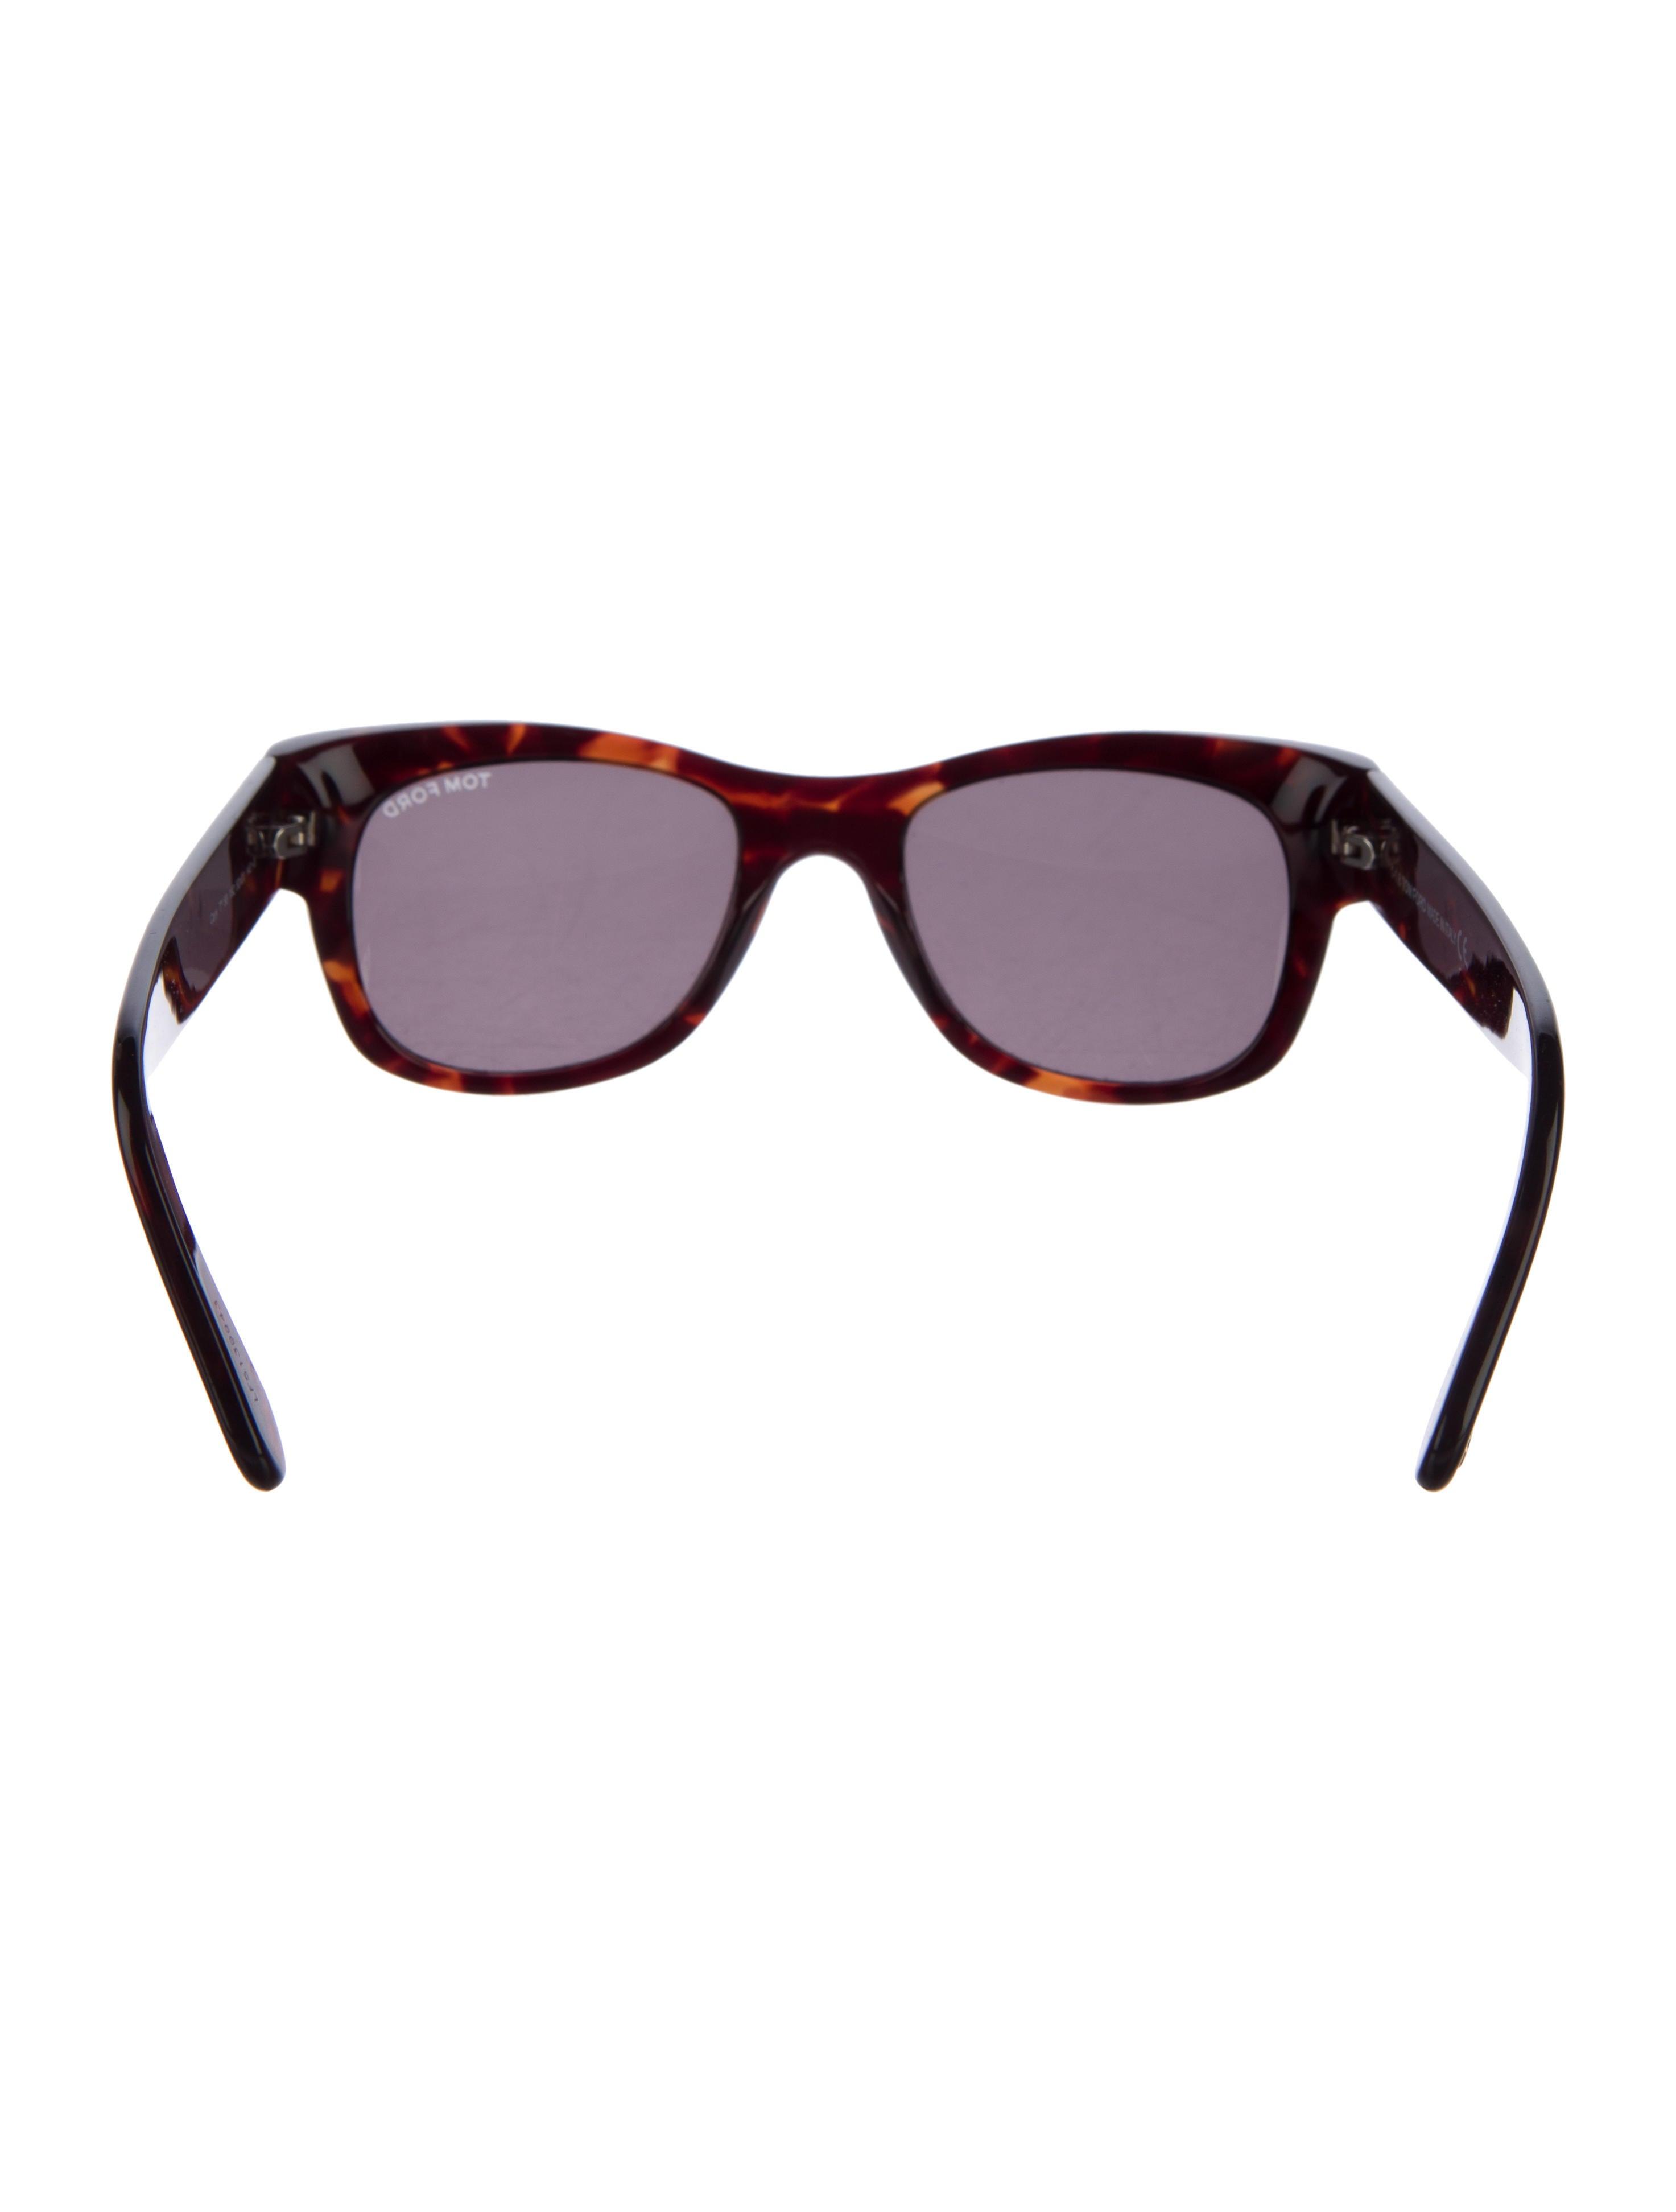 957e11a2848 Amazon Tom Ford Sunglasses Mens Cary - Bitterroot Public Library